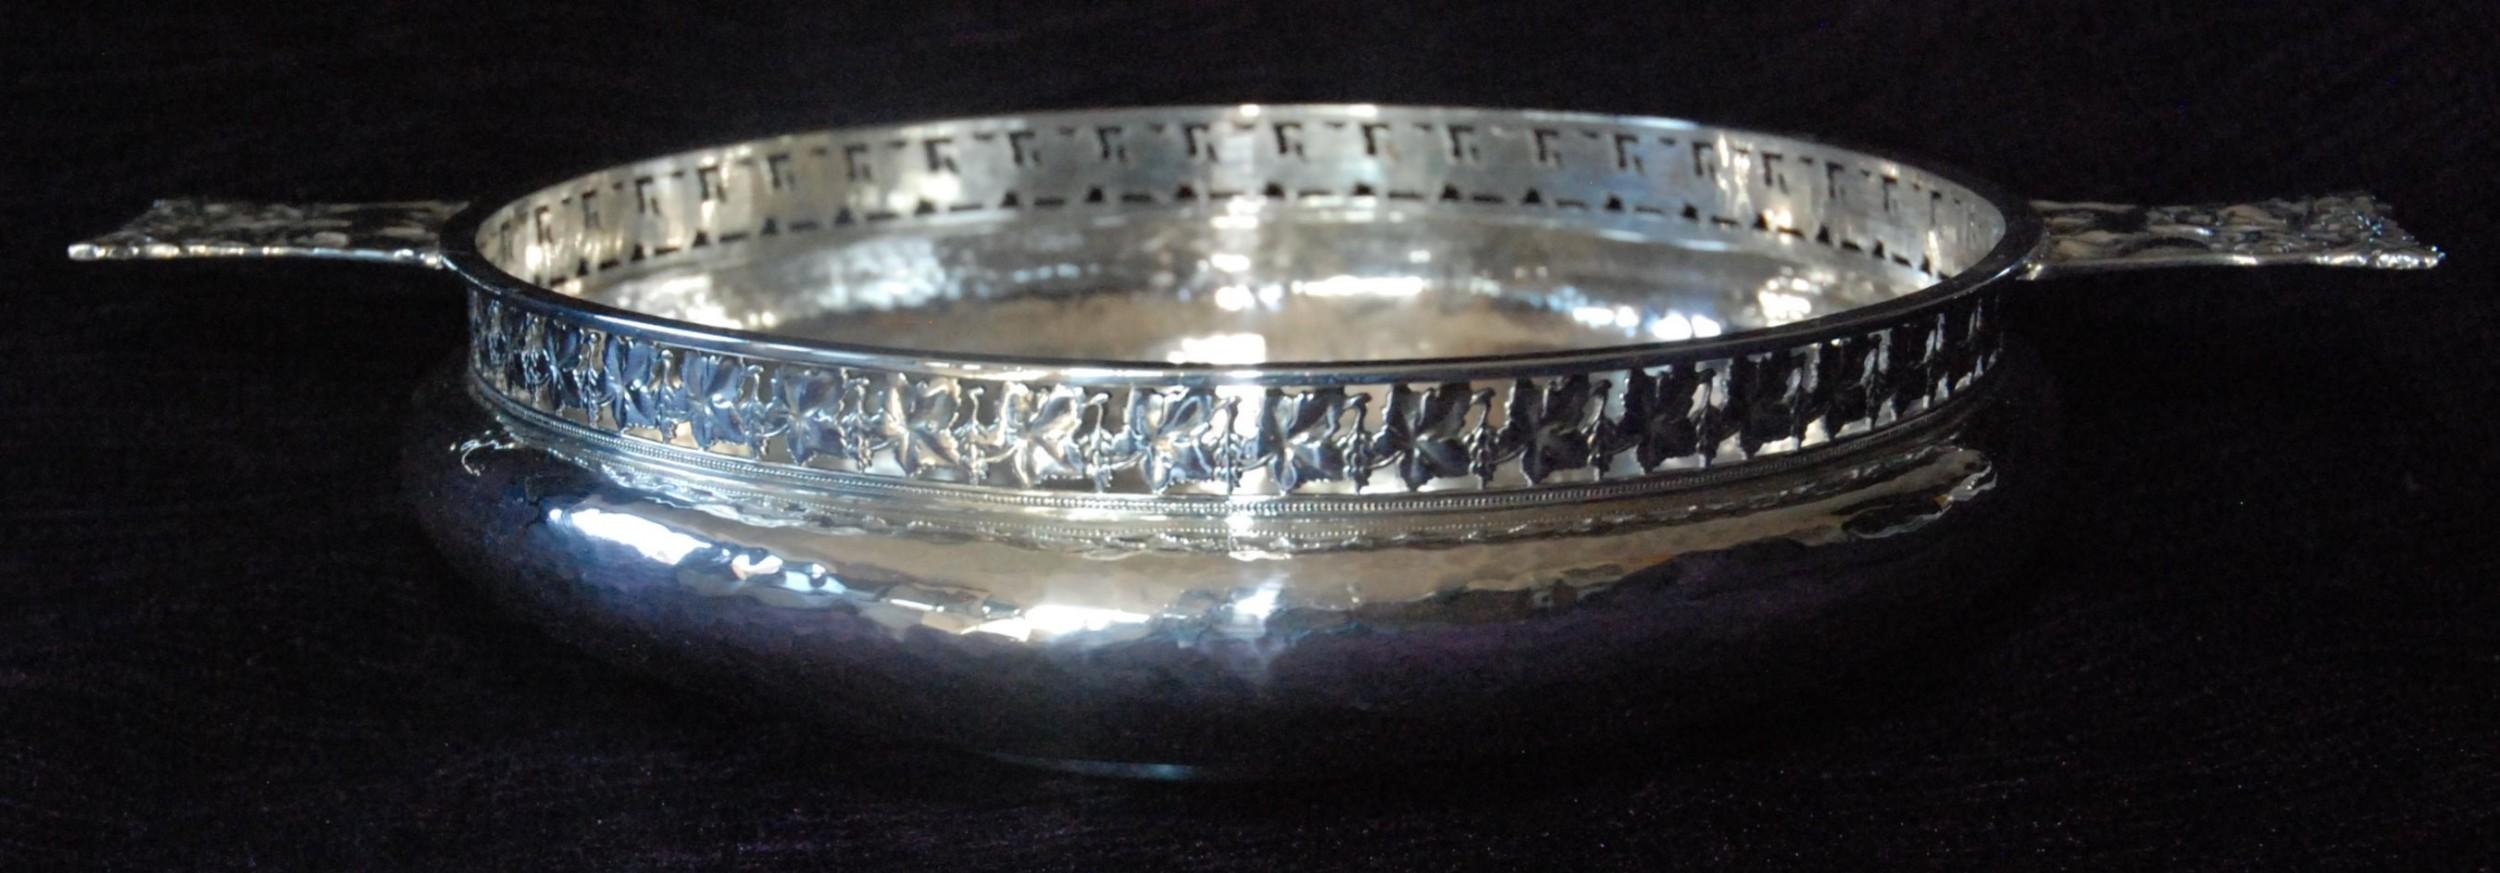 a e jones arts crafts silver bowl with fox and grapes design 1909